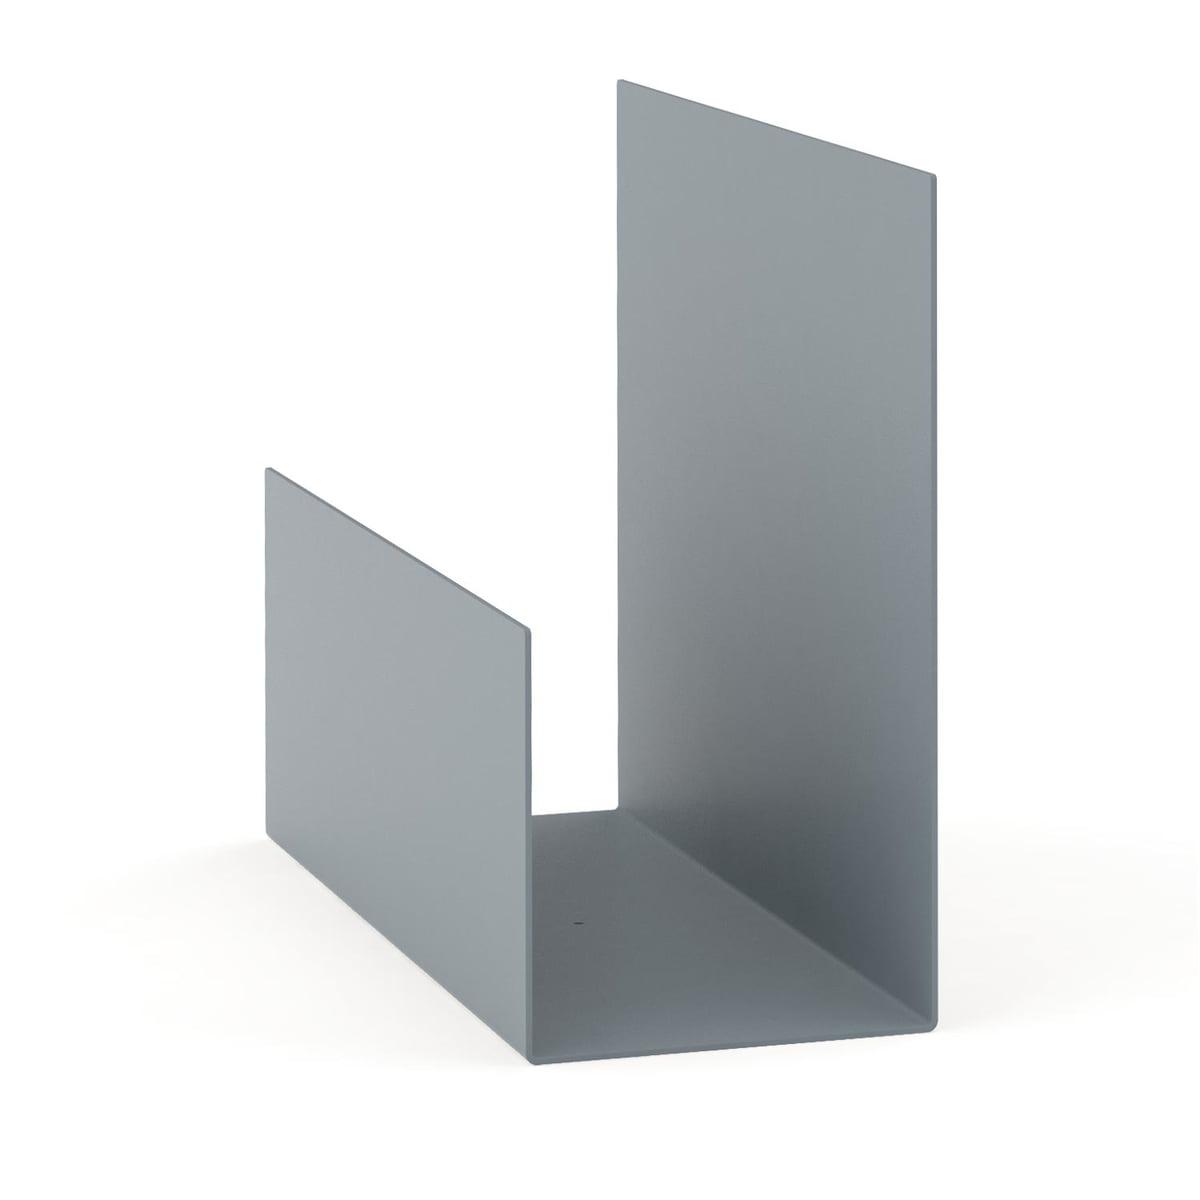 Konstantin Slawinski - El Regalsystem, grau | Wohnzimmer > Regale > Regalsysteme | Grau | Stahlblech -  pulverbeschichtet | Konstantin Slawinski